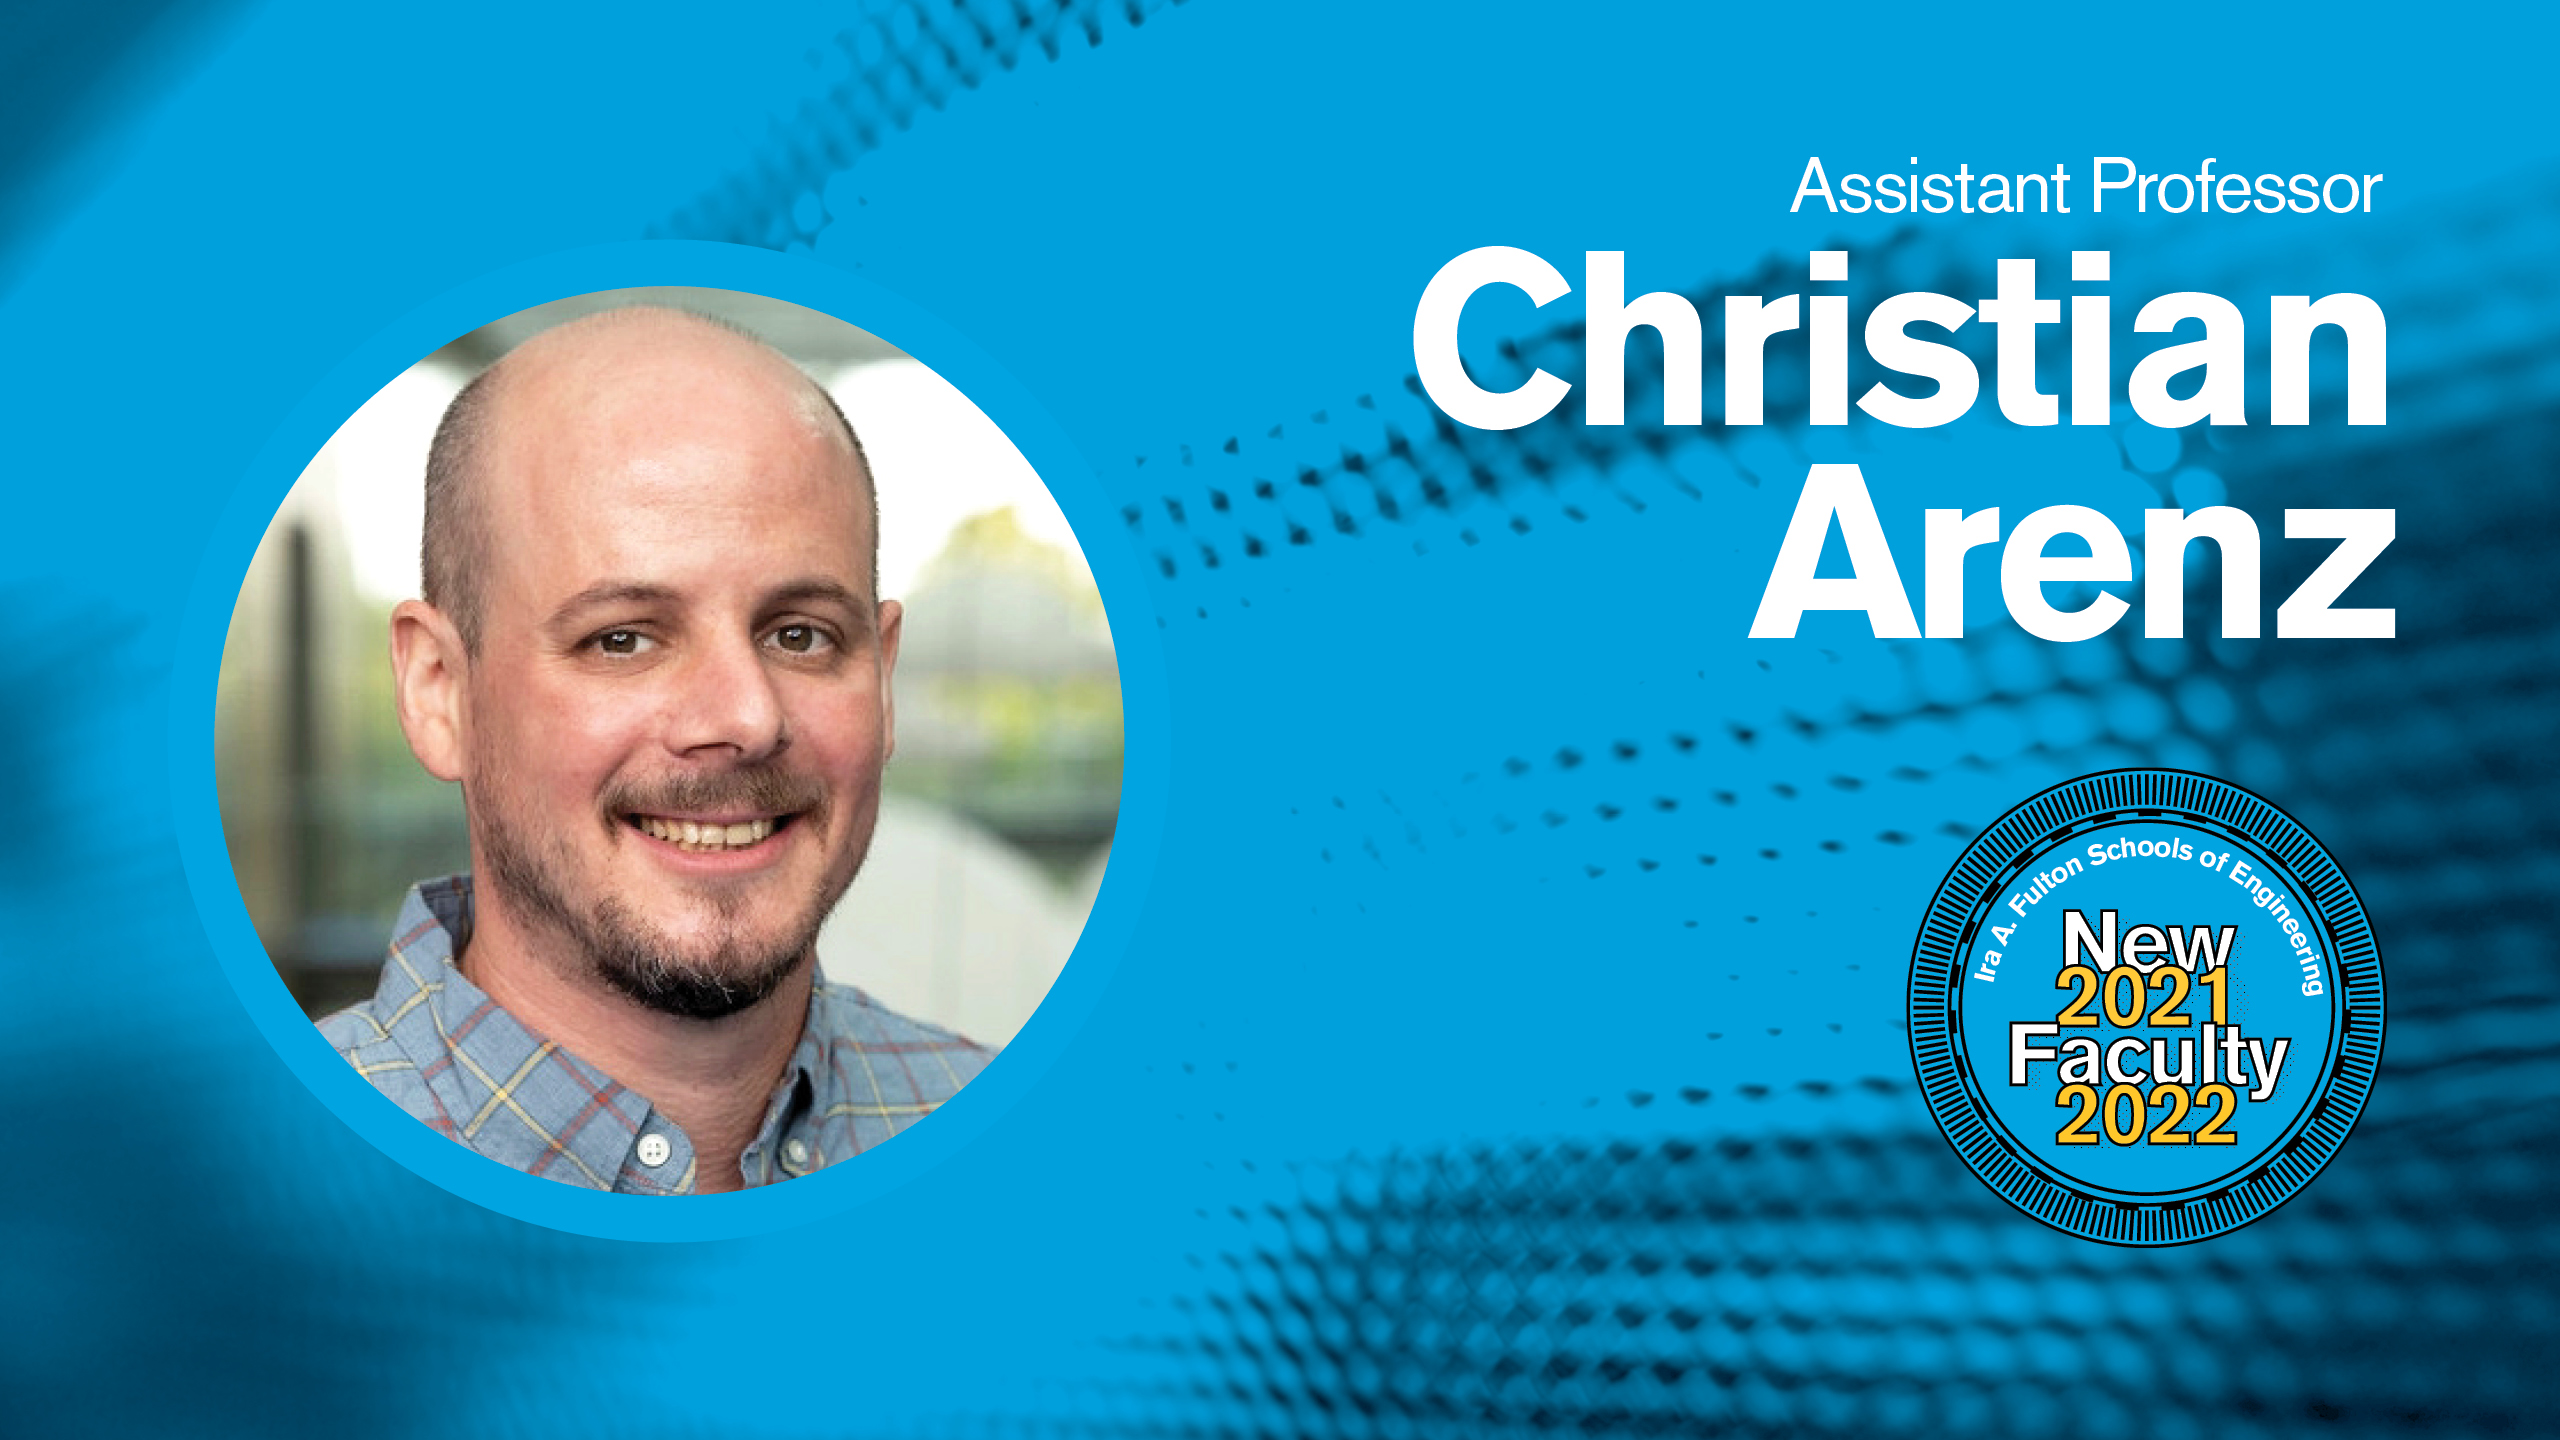 Christian Arenz